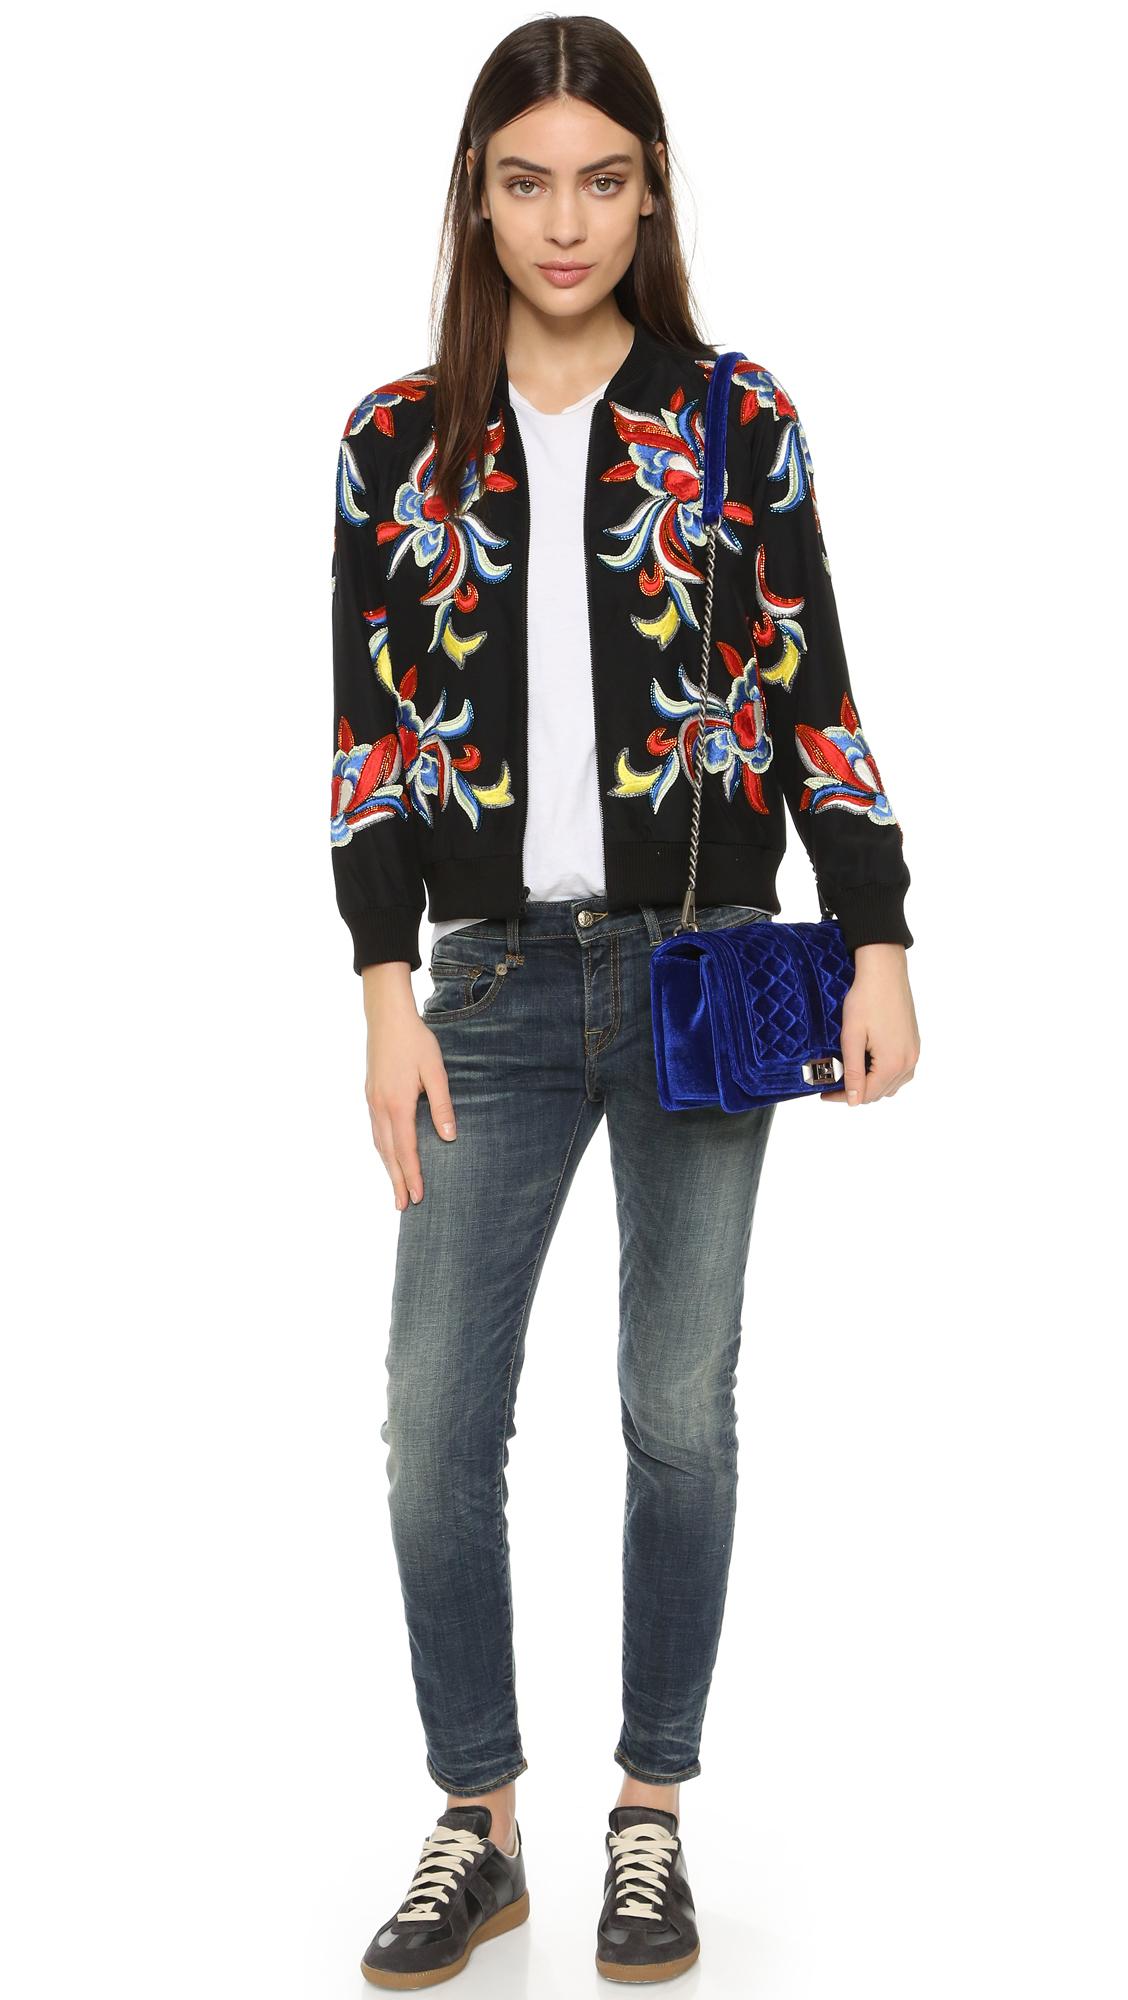 9933d71aa Rebecca Minkoff Velvet Love Cross Body Bag - Sapphire in Blue - Lyst